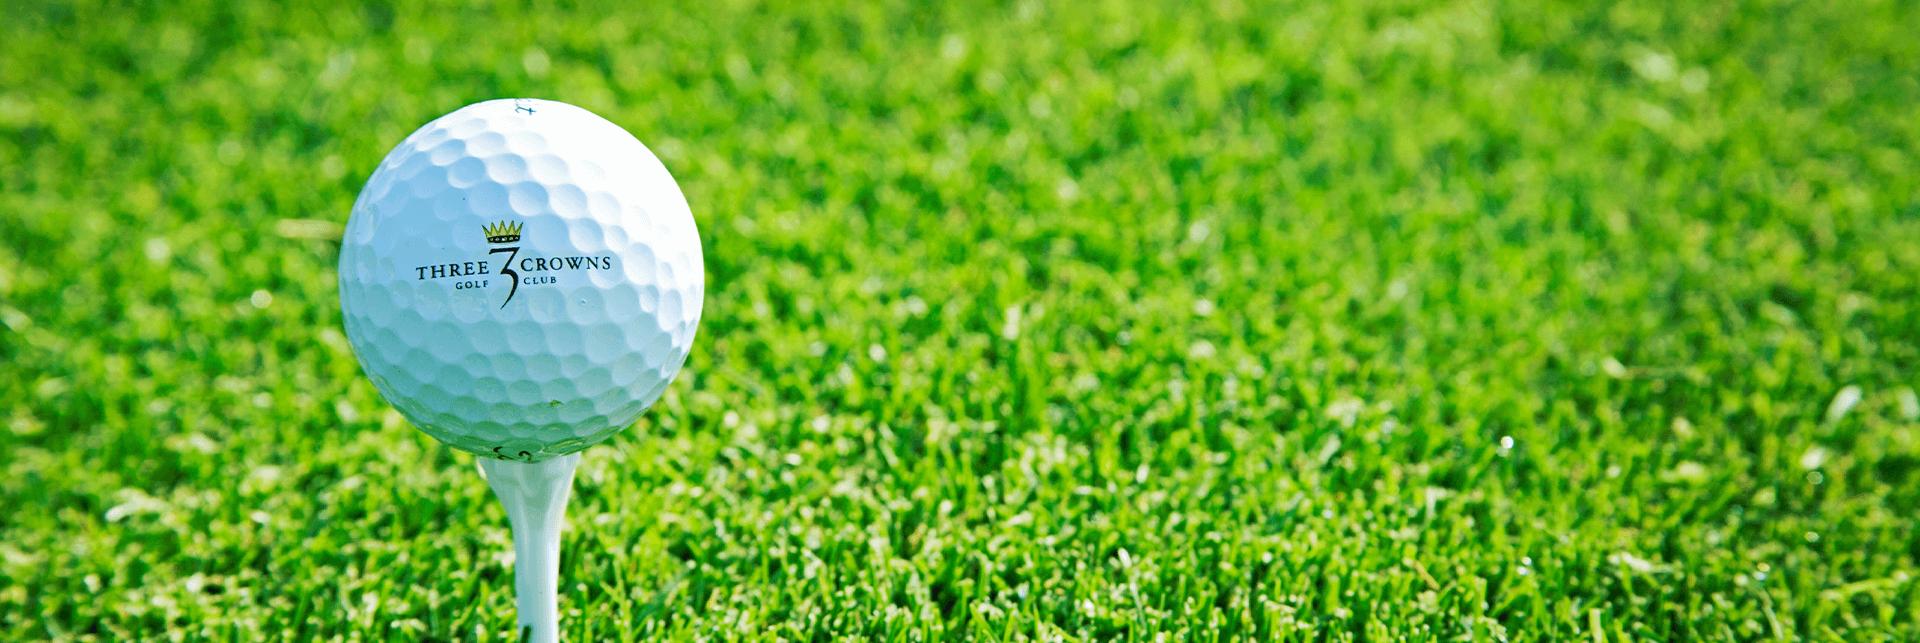 Three Crowns Golf Club Hero